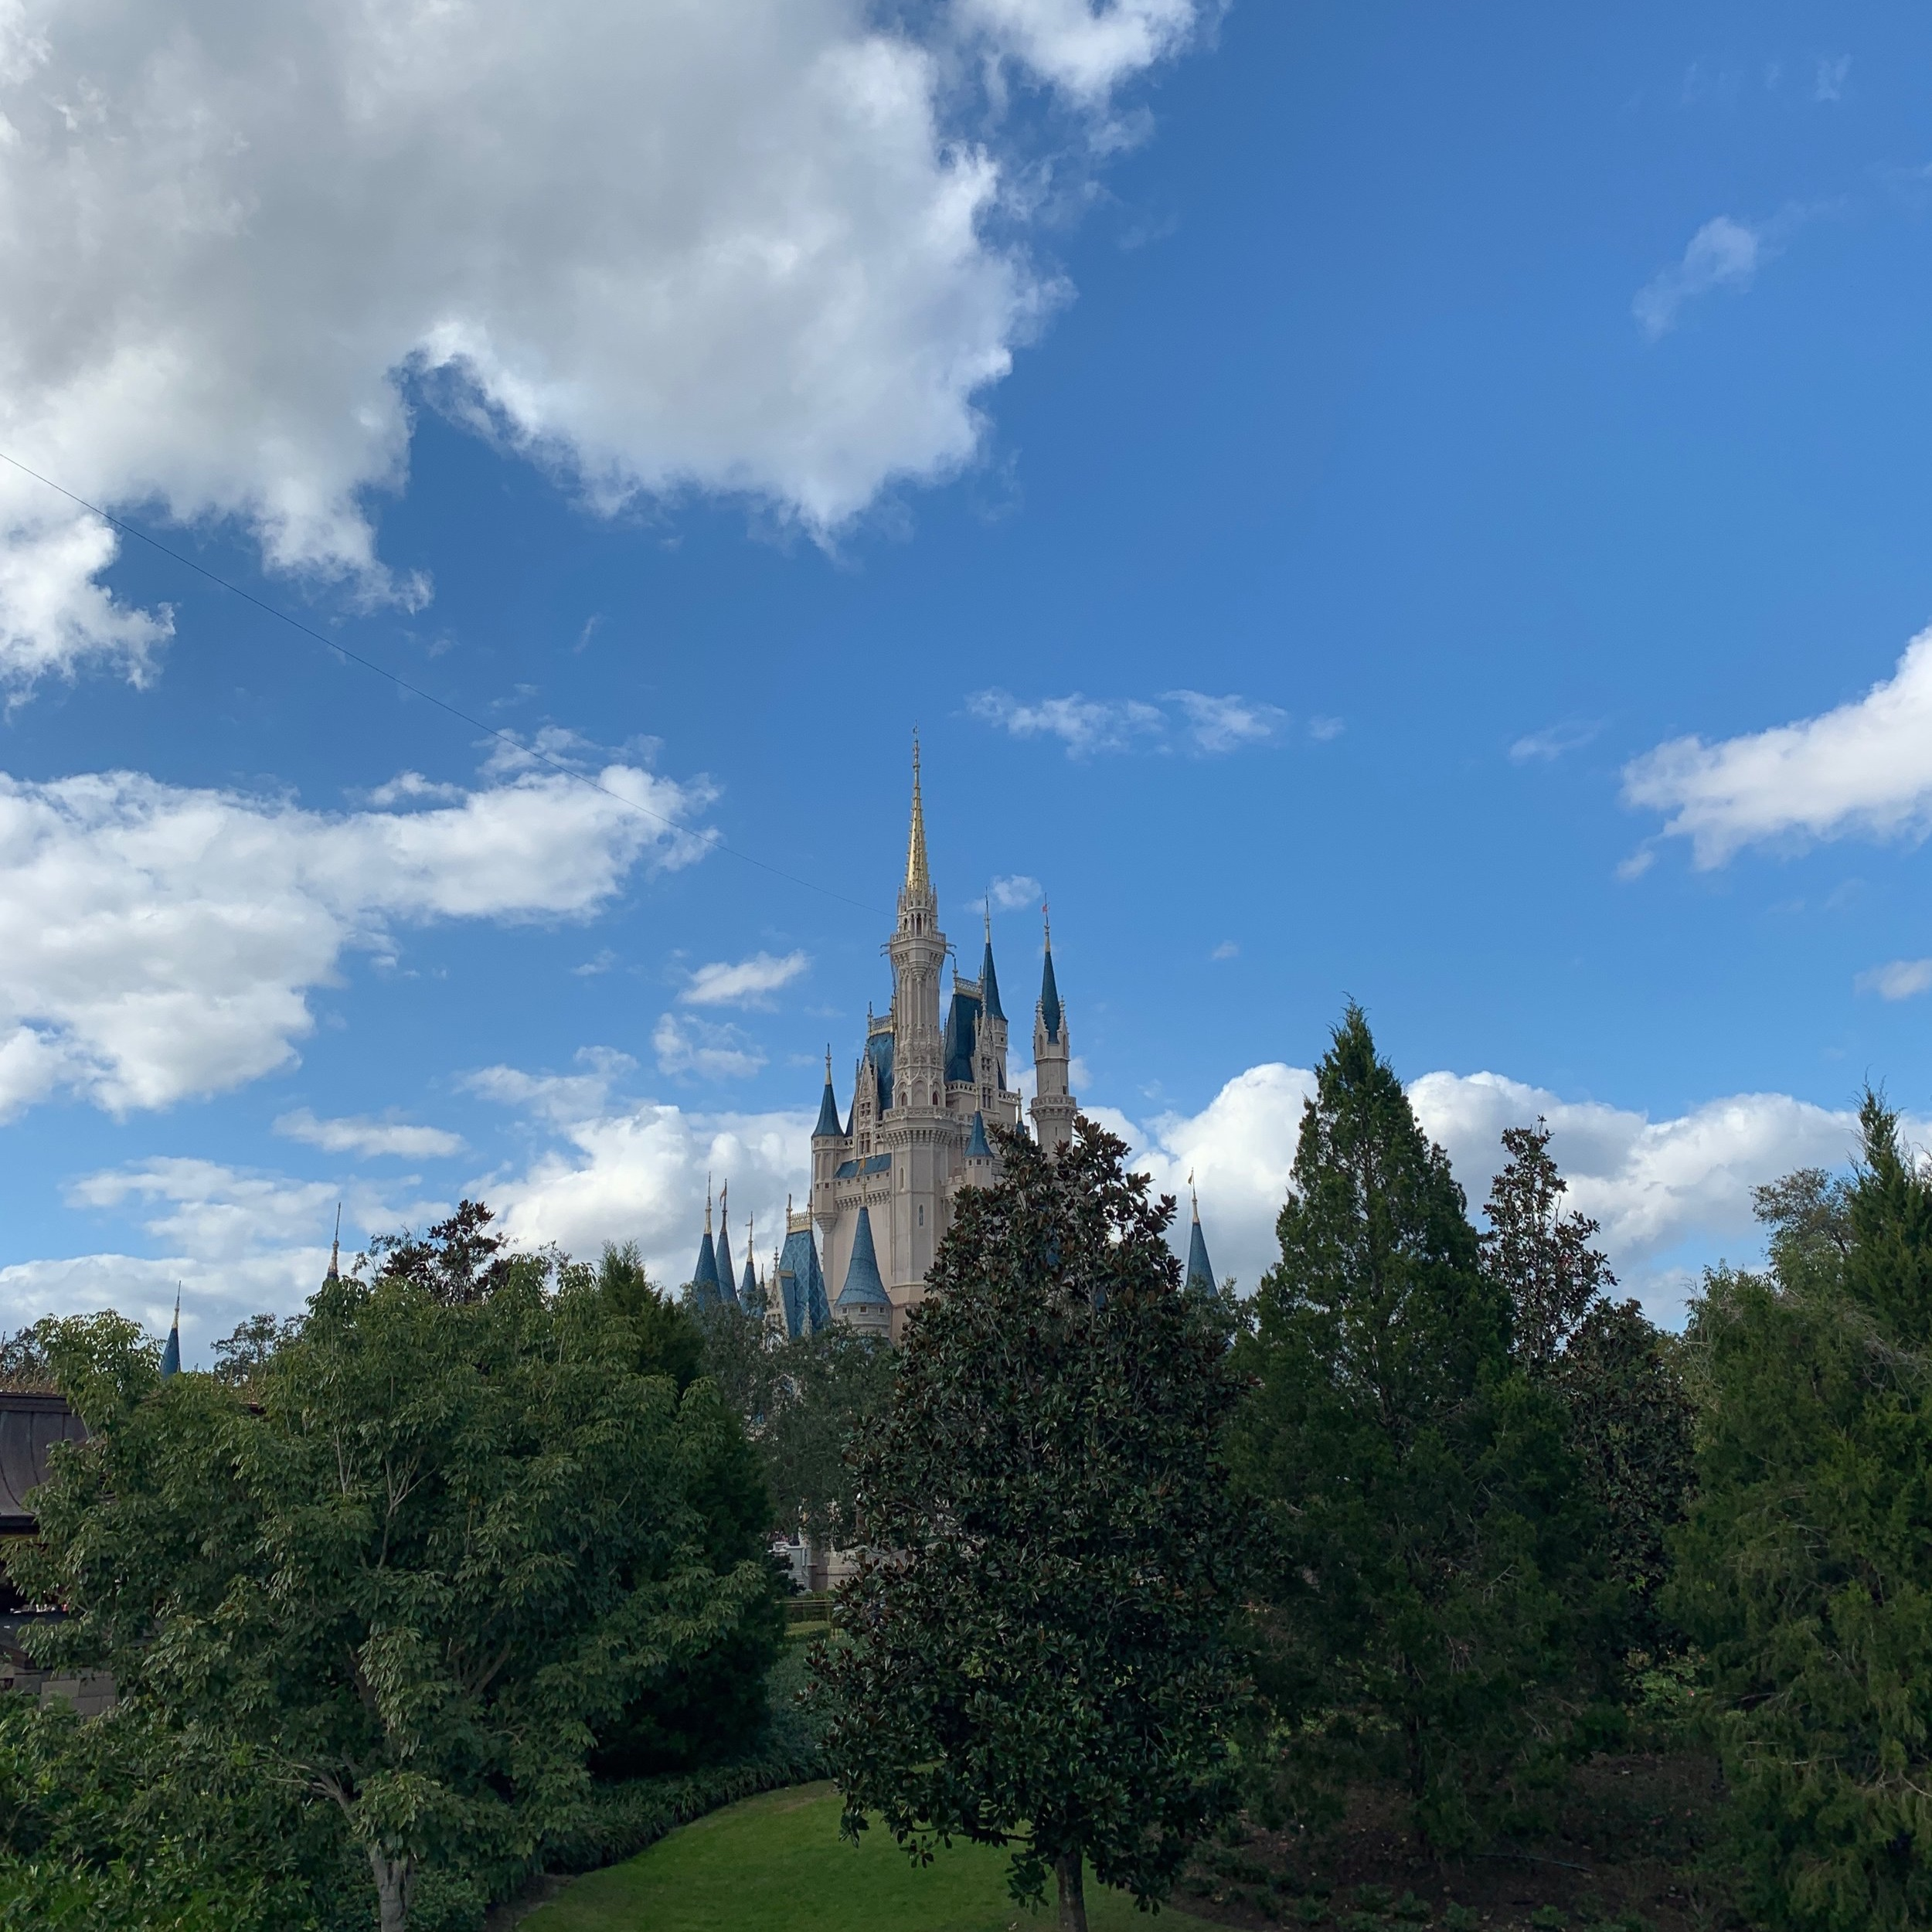 Disney's Magic Kingdom Castle